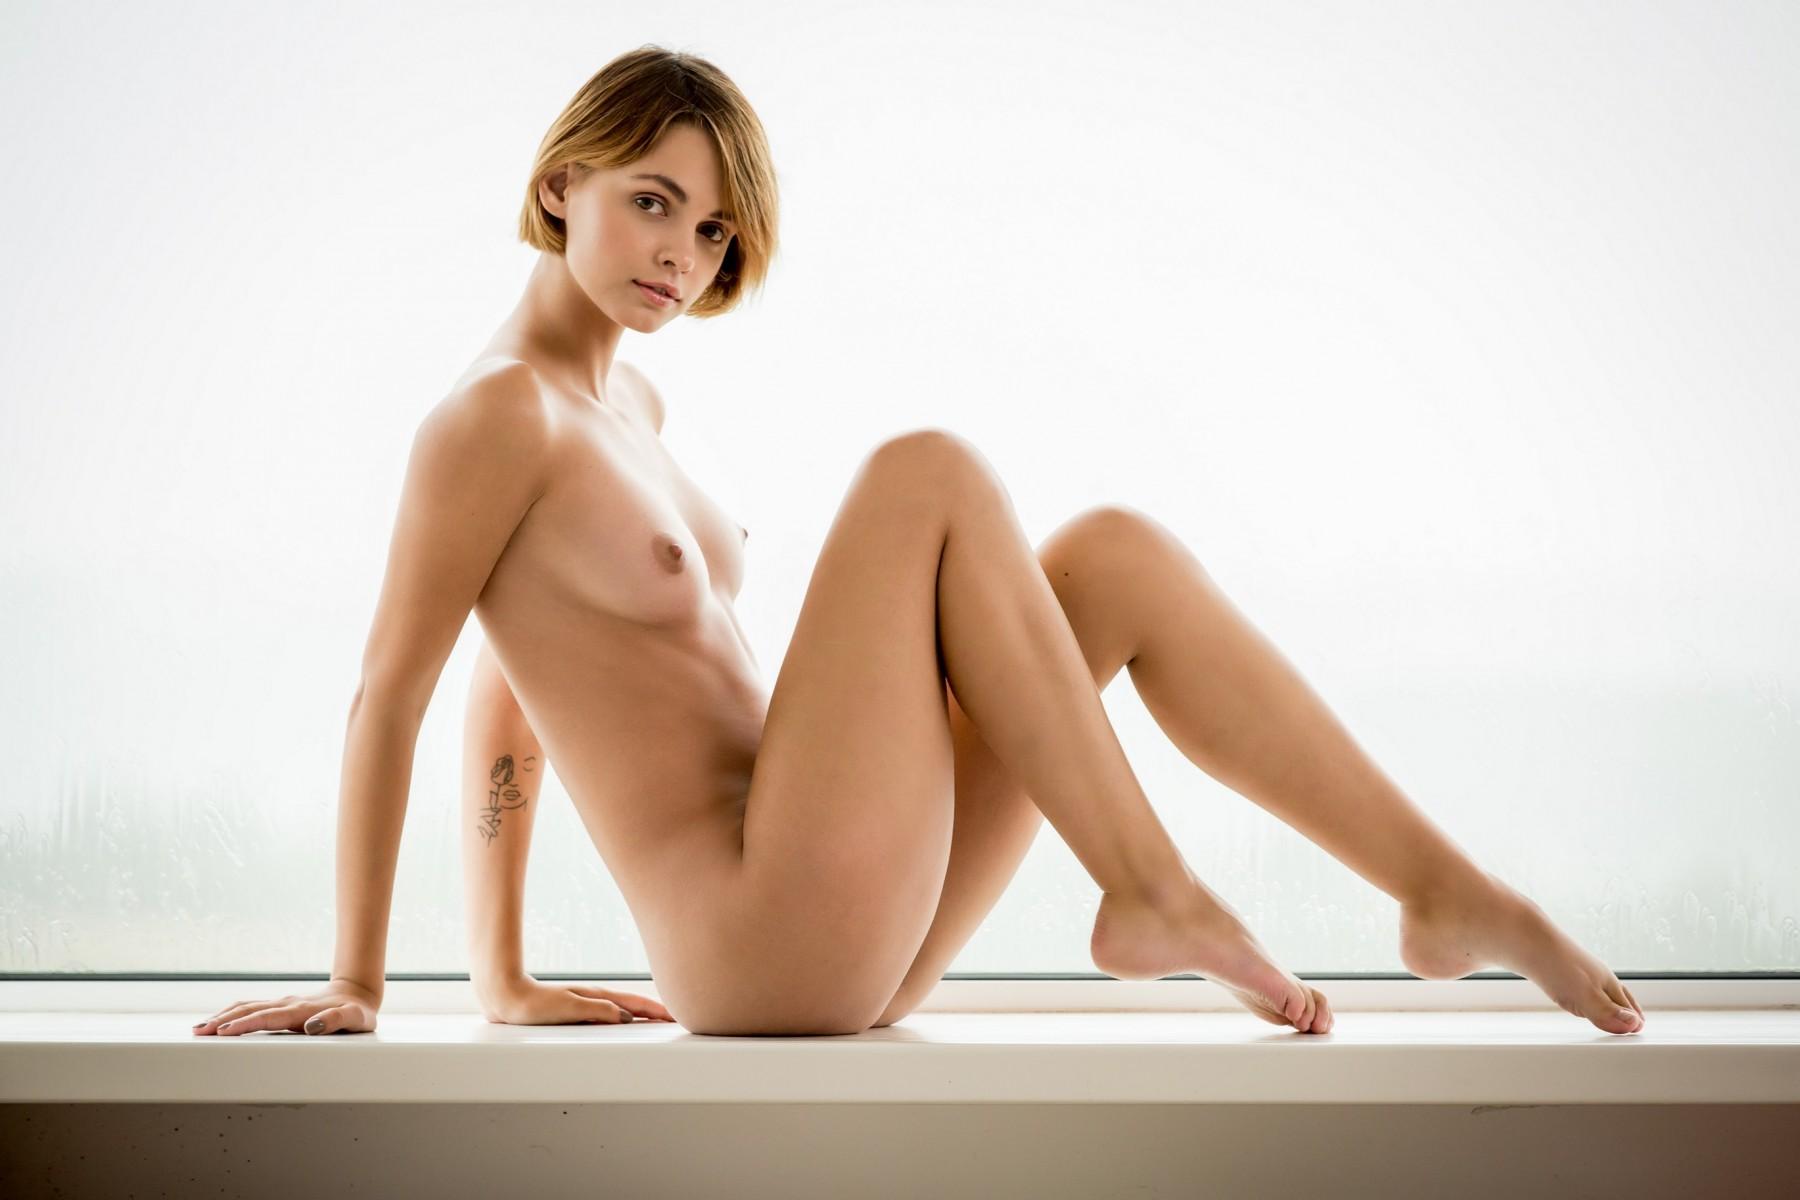 stylez-anal-lean-girl-nude